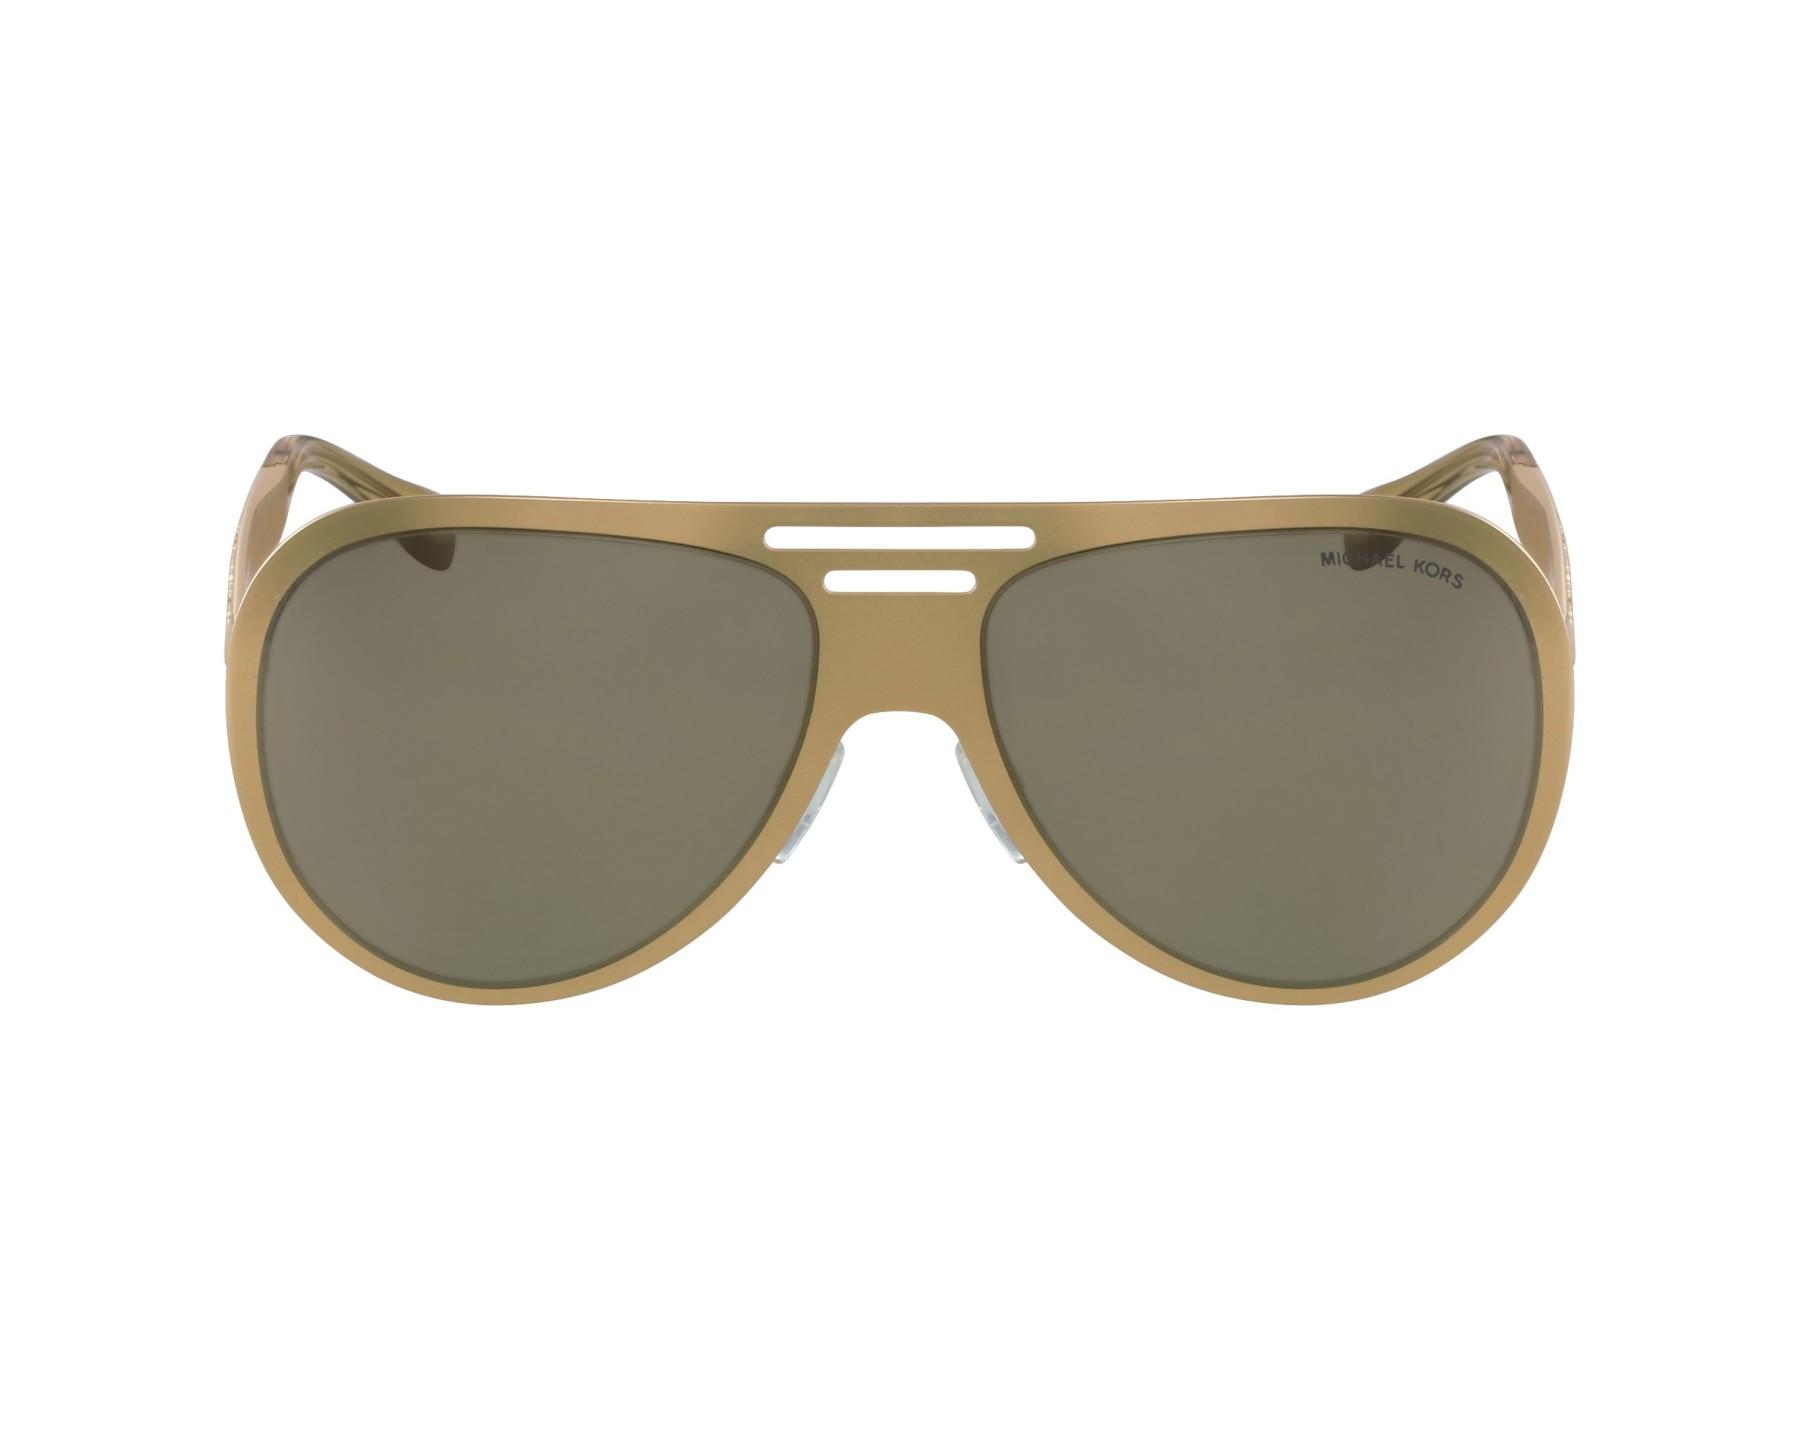 28e48316a760 Sunglasses Michael Kors MK-5011 1062R5 - Gold profile view